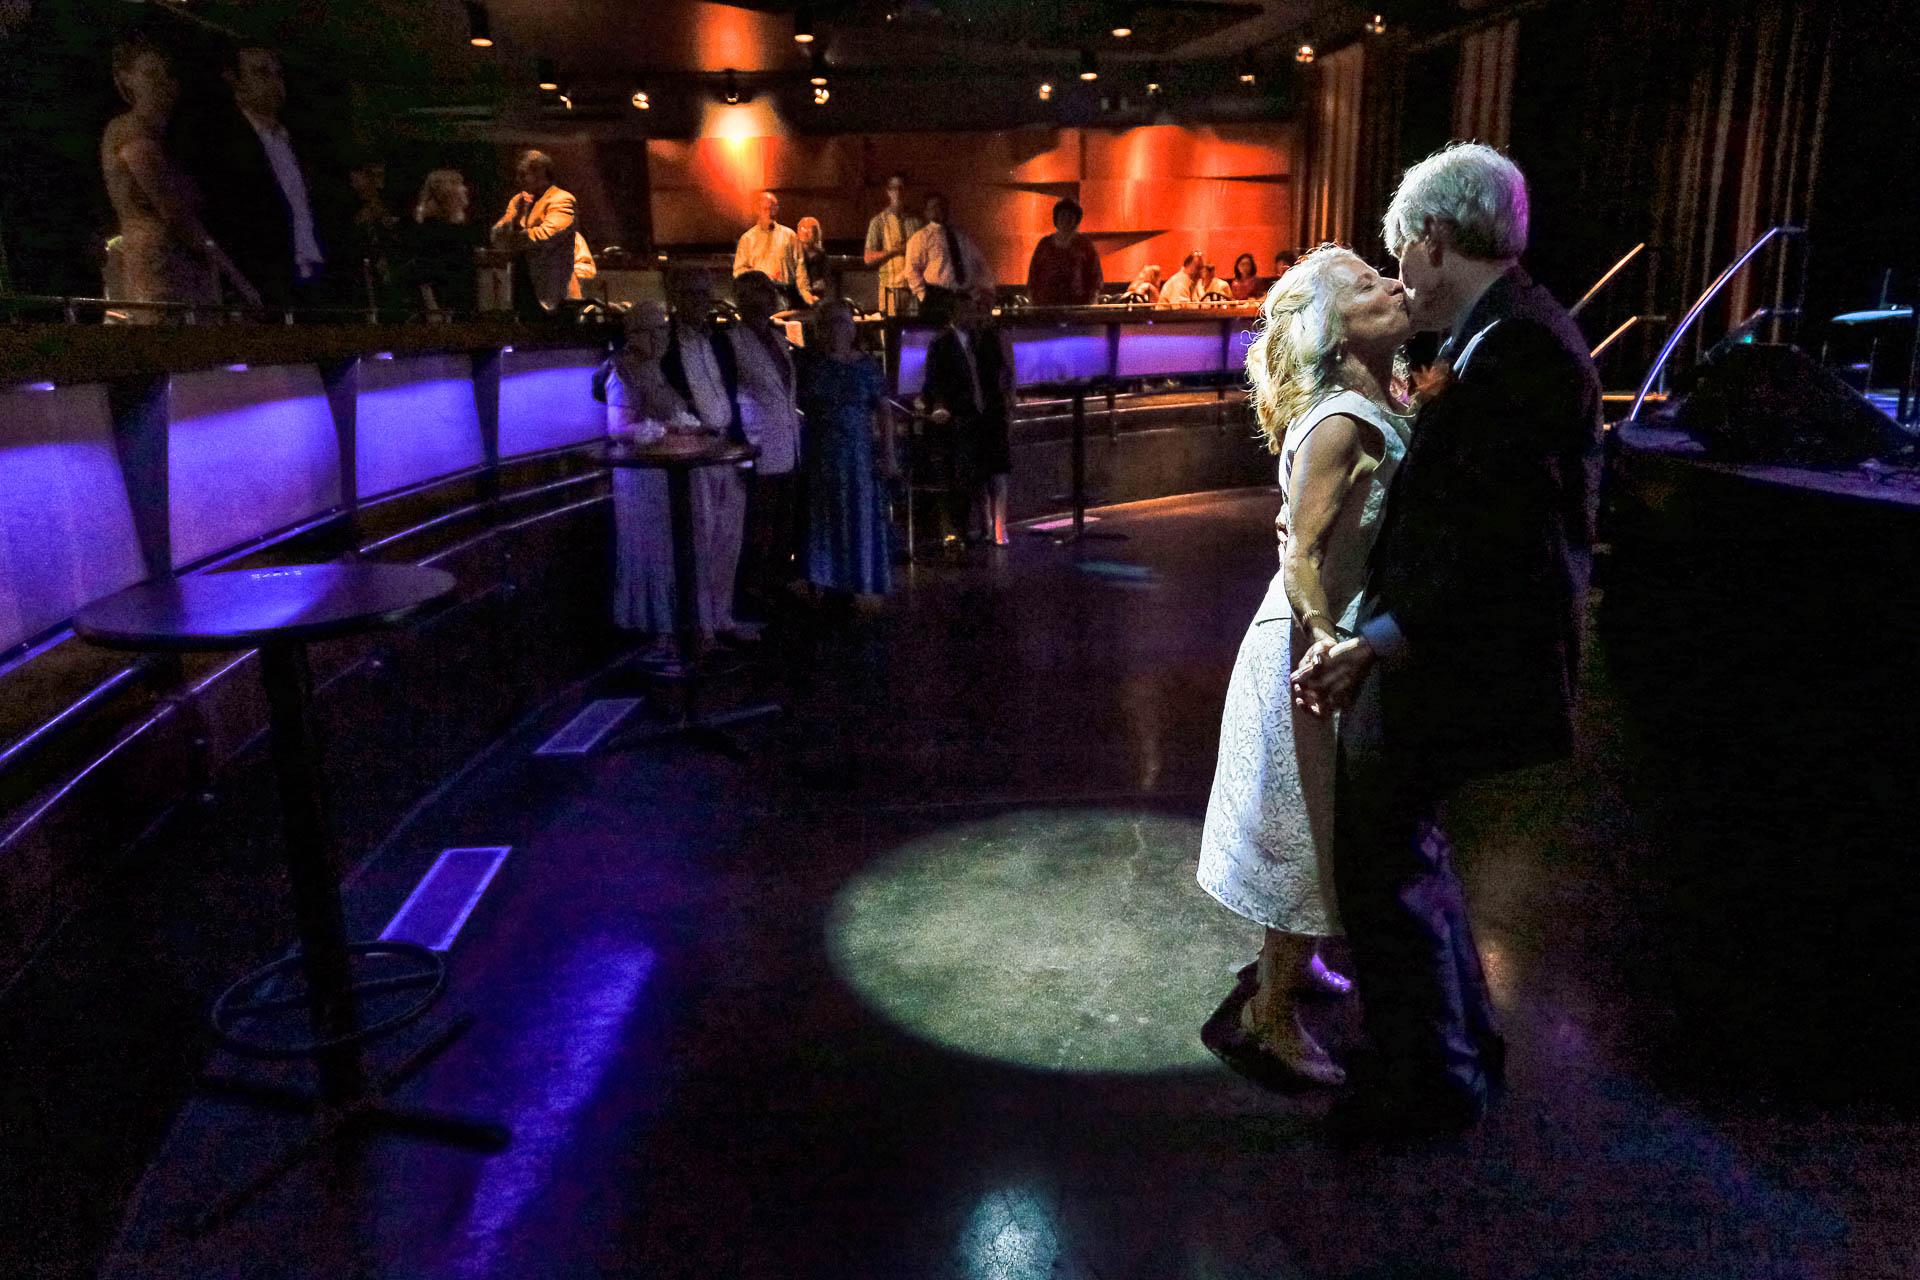 WEDDING-Karen-Mark-28Sep2014-MTO0634-Edit-Edit.jpg